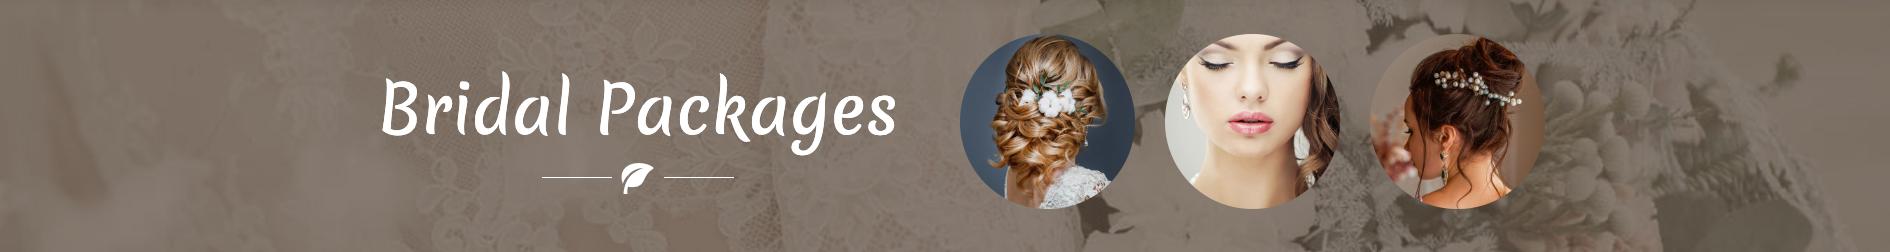 Bridal_header.png